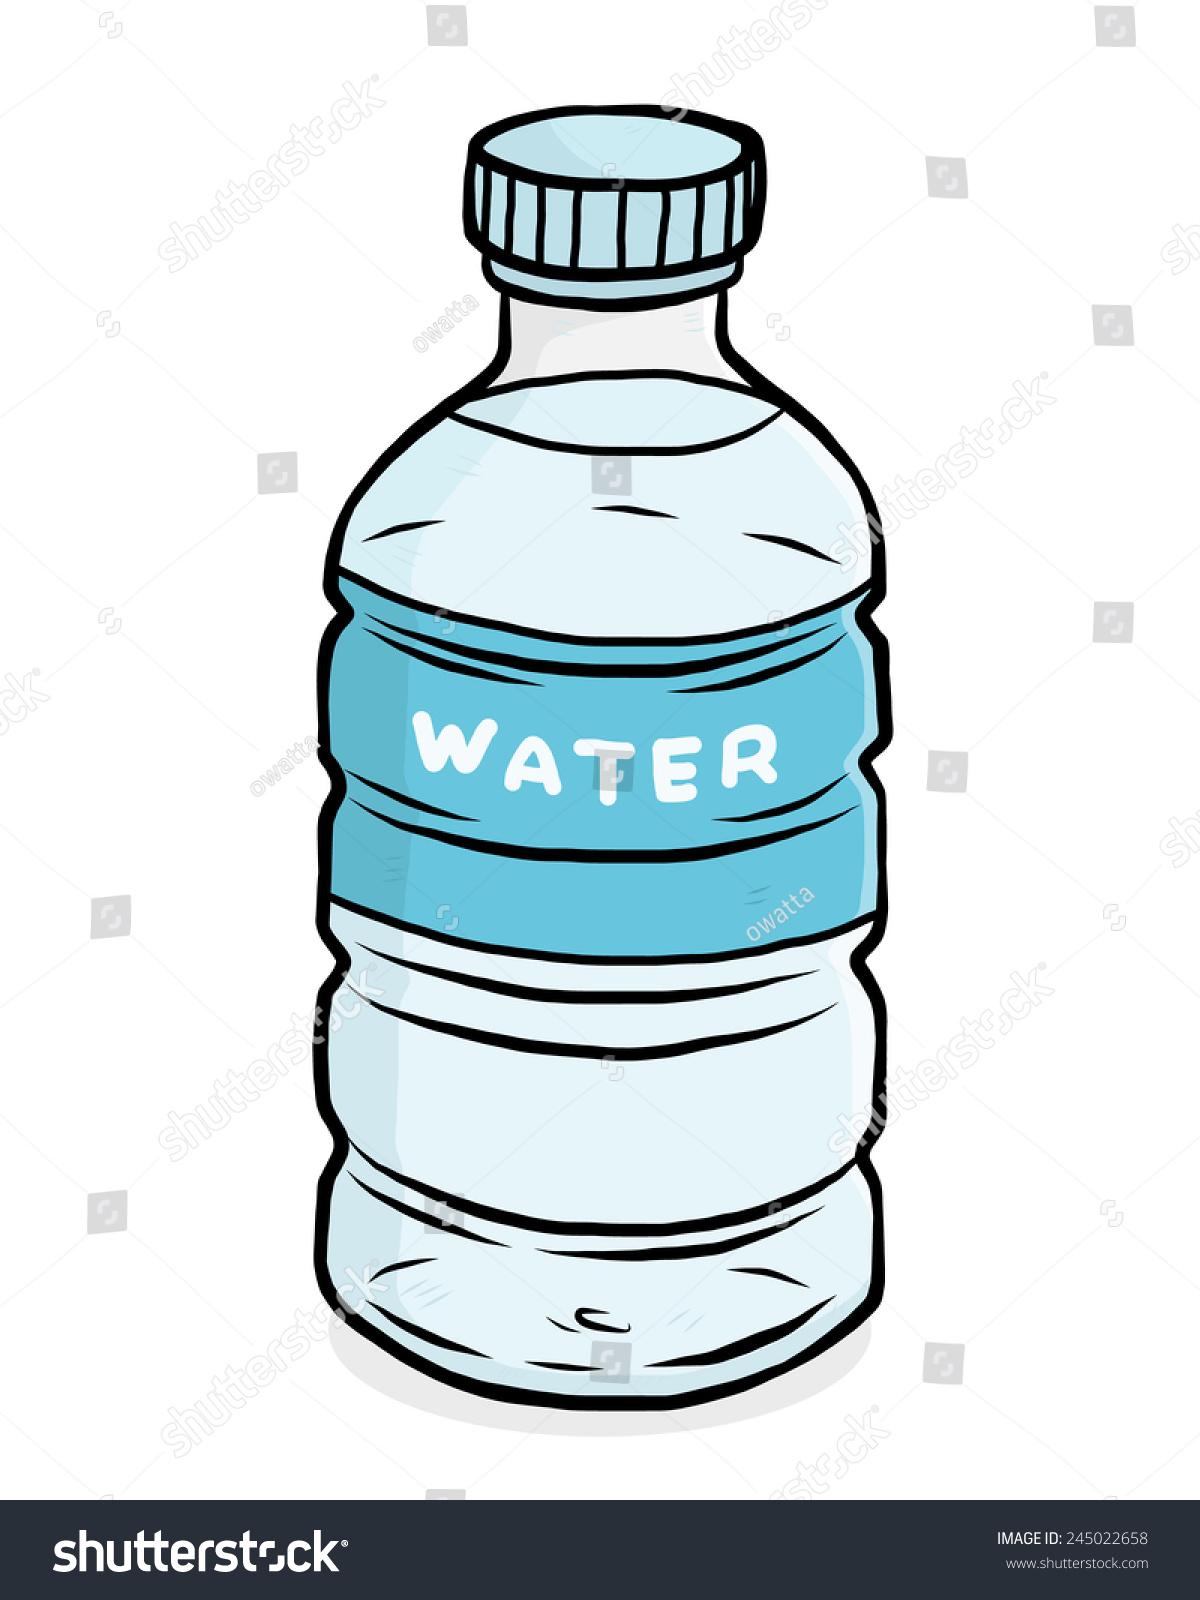 Water Plastic Bottle Cartoon Vector Illustration Stock Vector ...